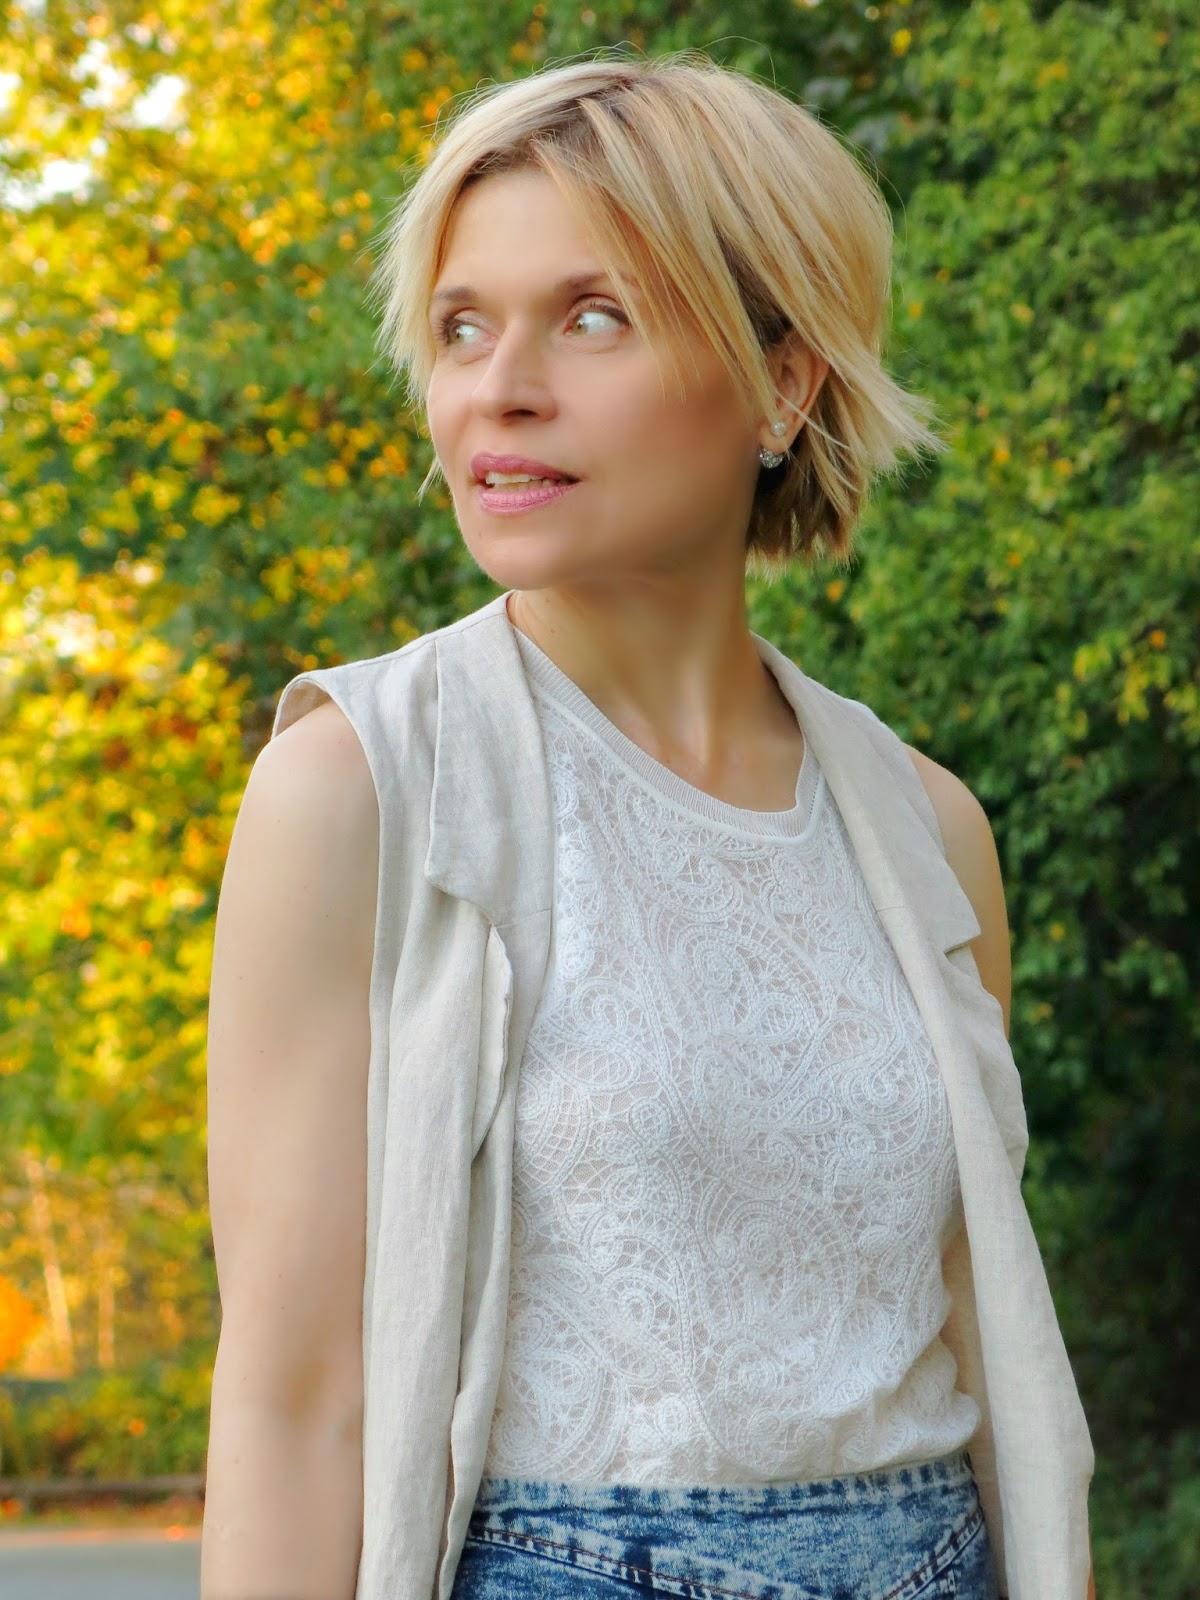 acid-wash denim pencil skirt, lacy top, and sleeveless linen coat